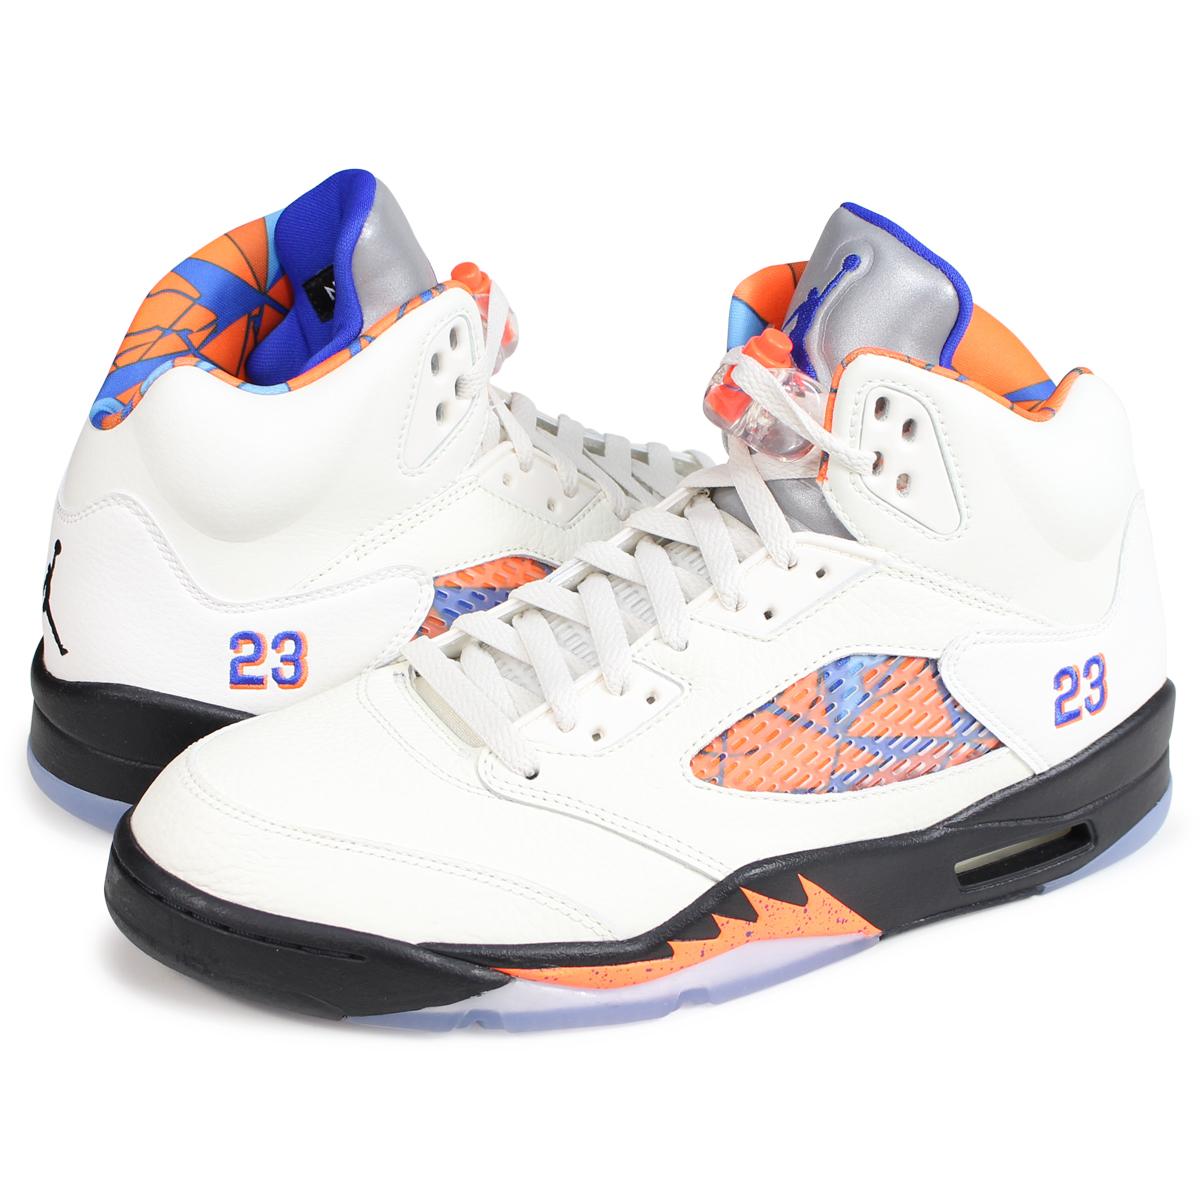 buy popular 9f259 d717e NIKE AIR JORDAN 5 RETRO Nike Air Jordan 5 nostalgic sneakers men  136,027-148 white ...